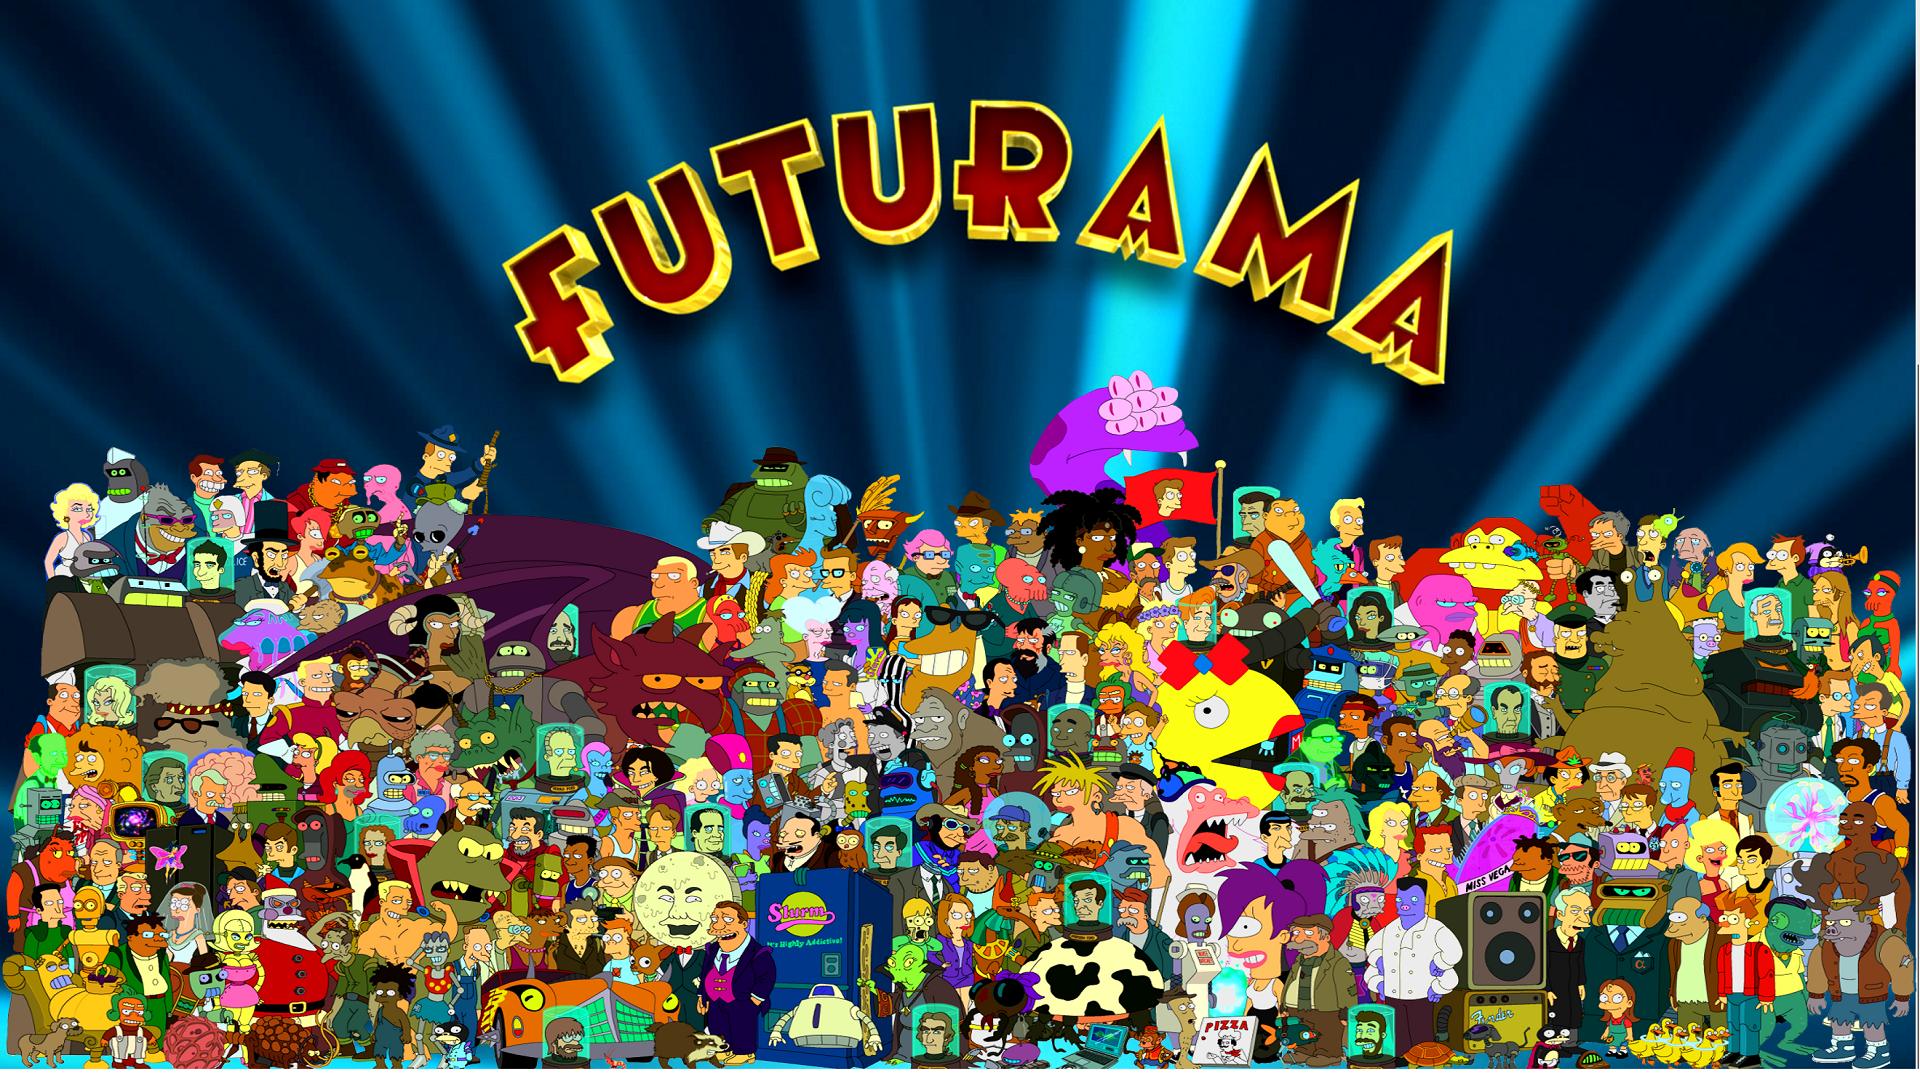 Futurama desktop wallpaper wallpapersafari - Futurama wallpaper ...